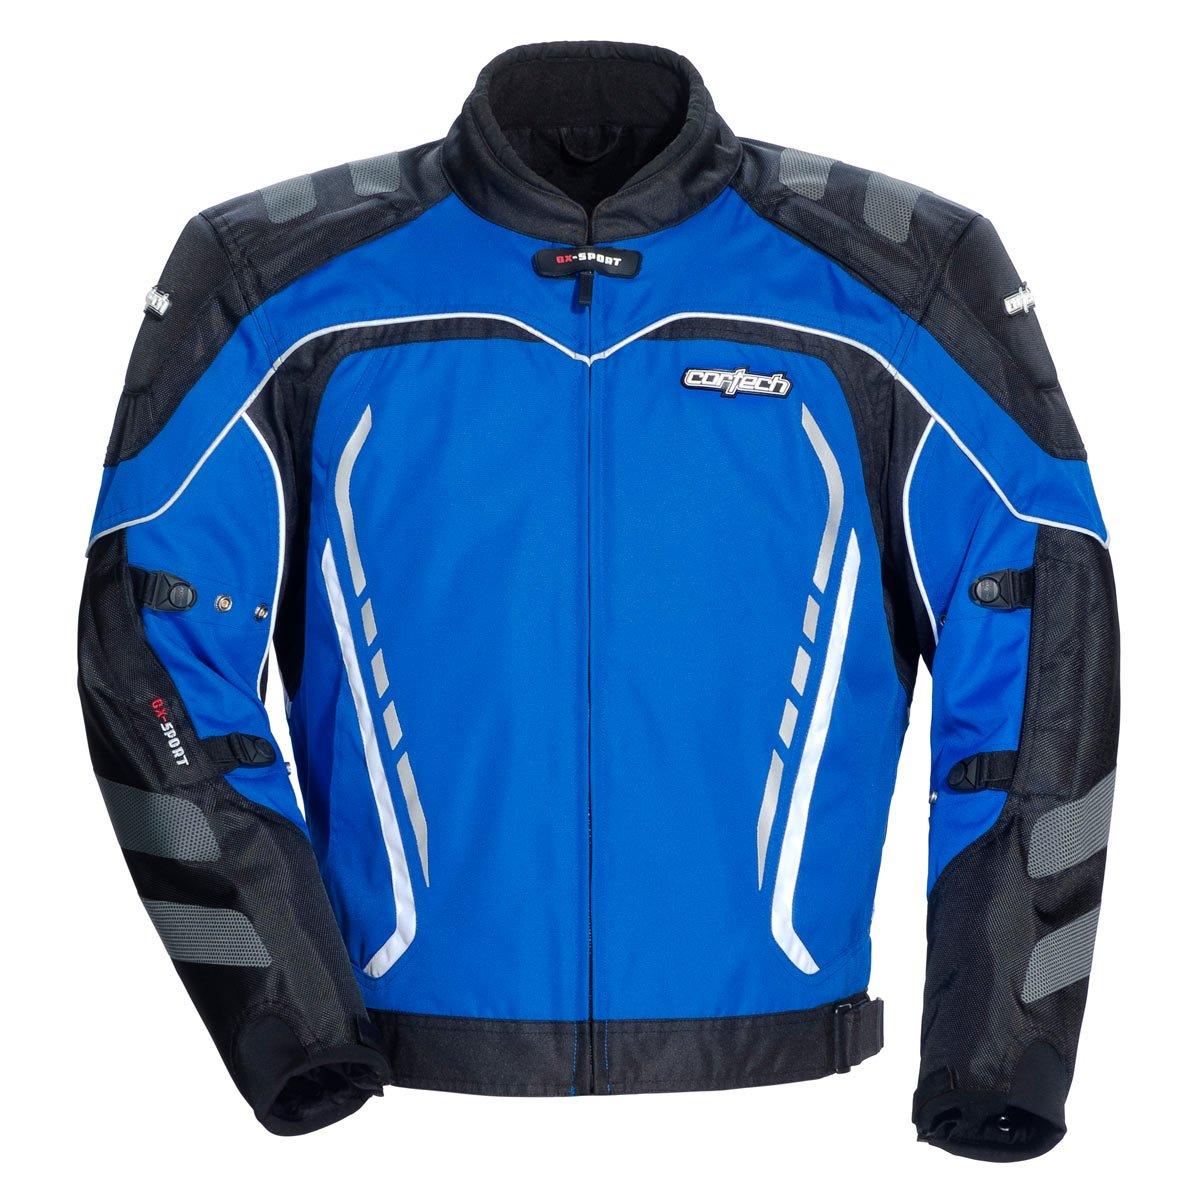 Cortech GX Sport 3 Men's Textile Armored Motorcycle Jacket (Blue/Black, Large)